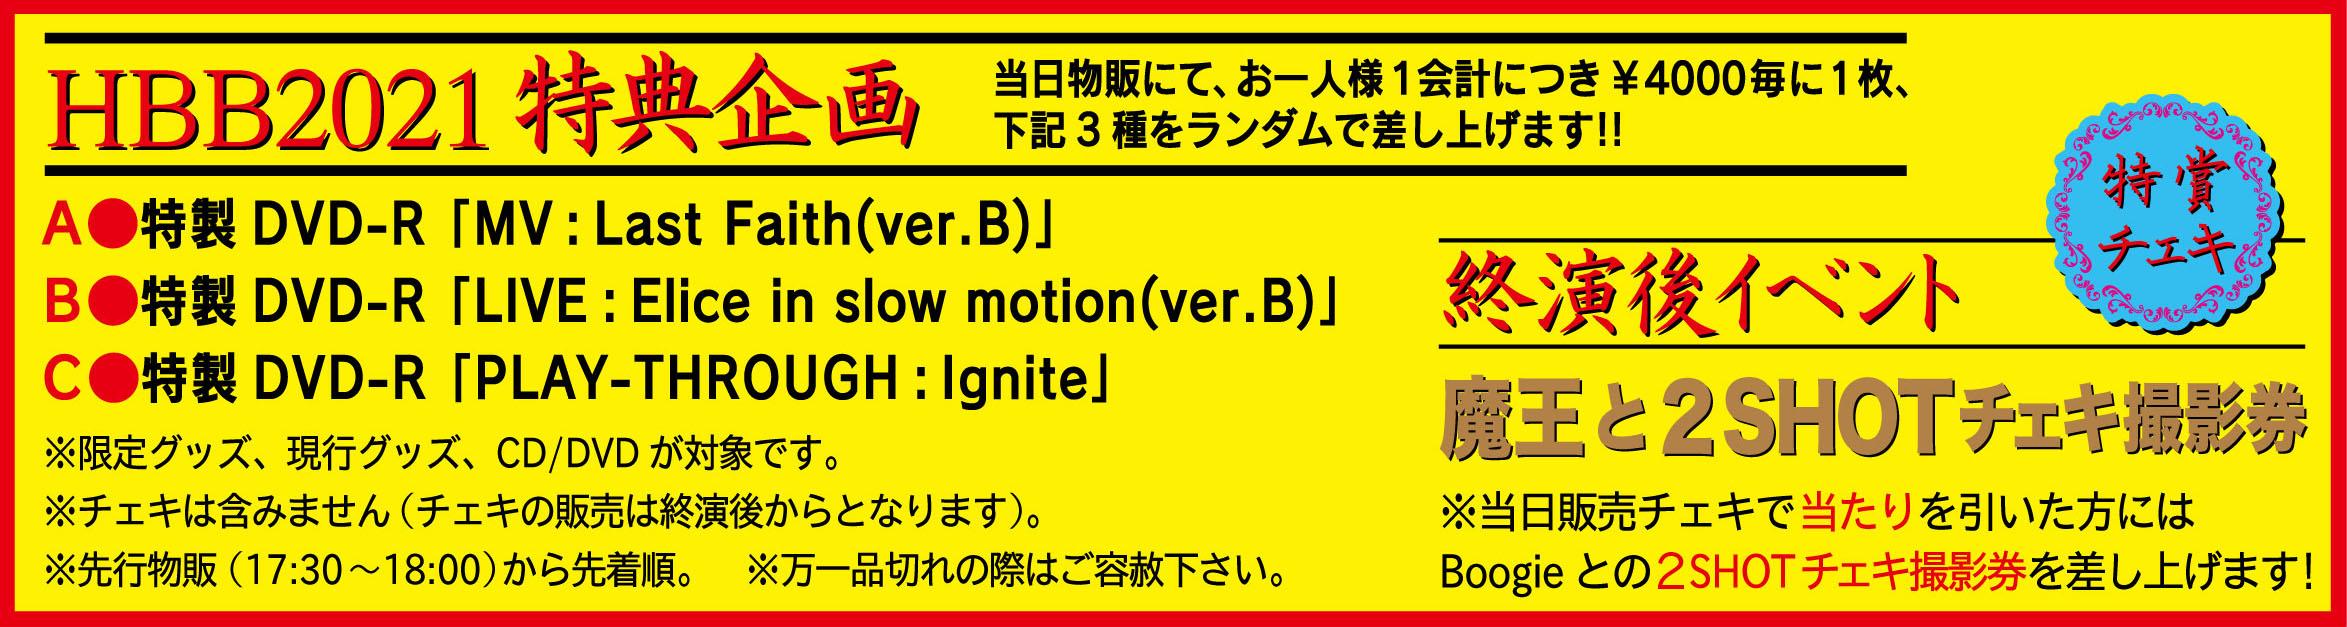 HBB2021_GOODS_告知CS6